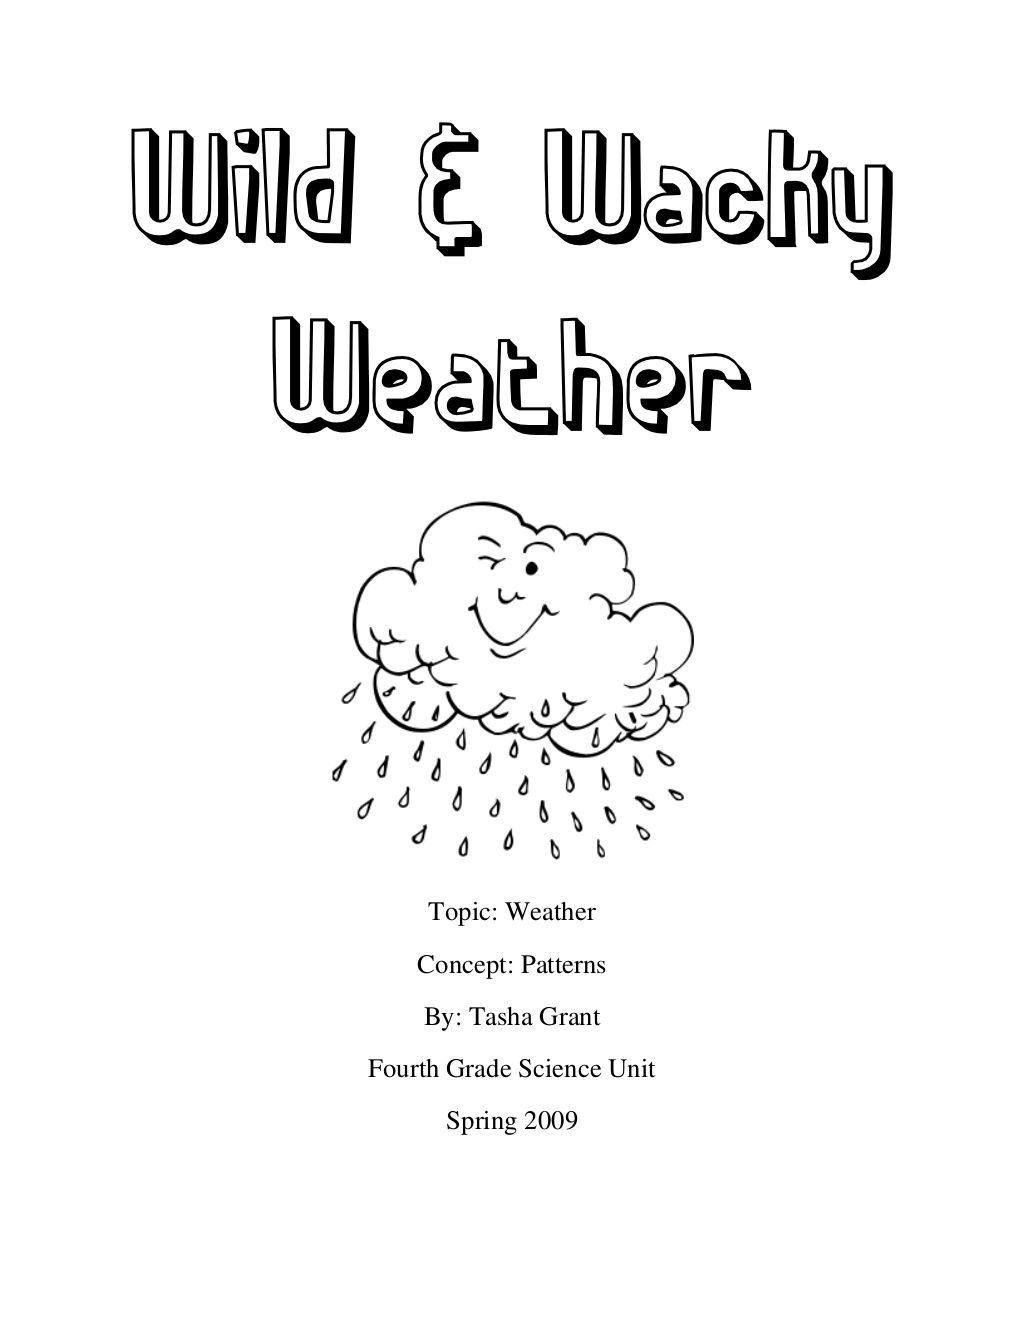 Fourth Grade Worksample Weather Unit By Tasha Grant Via